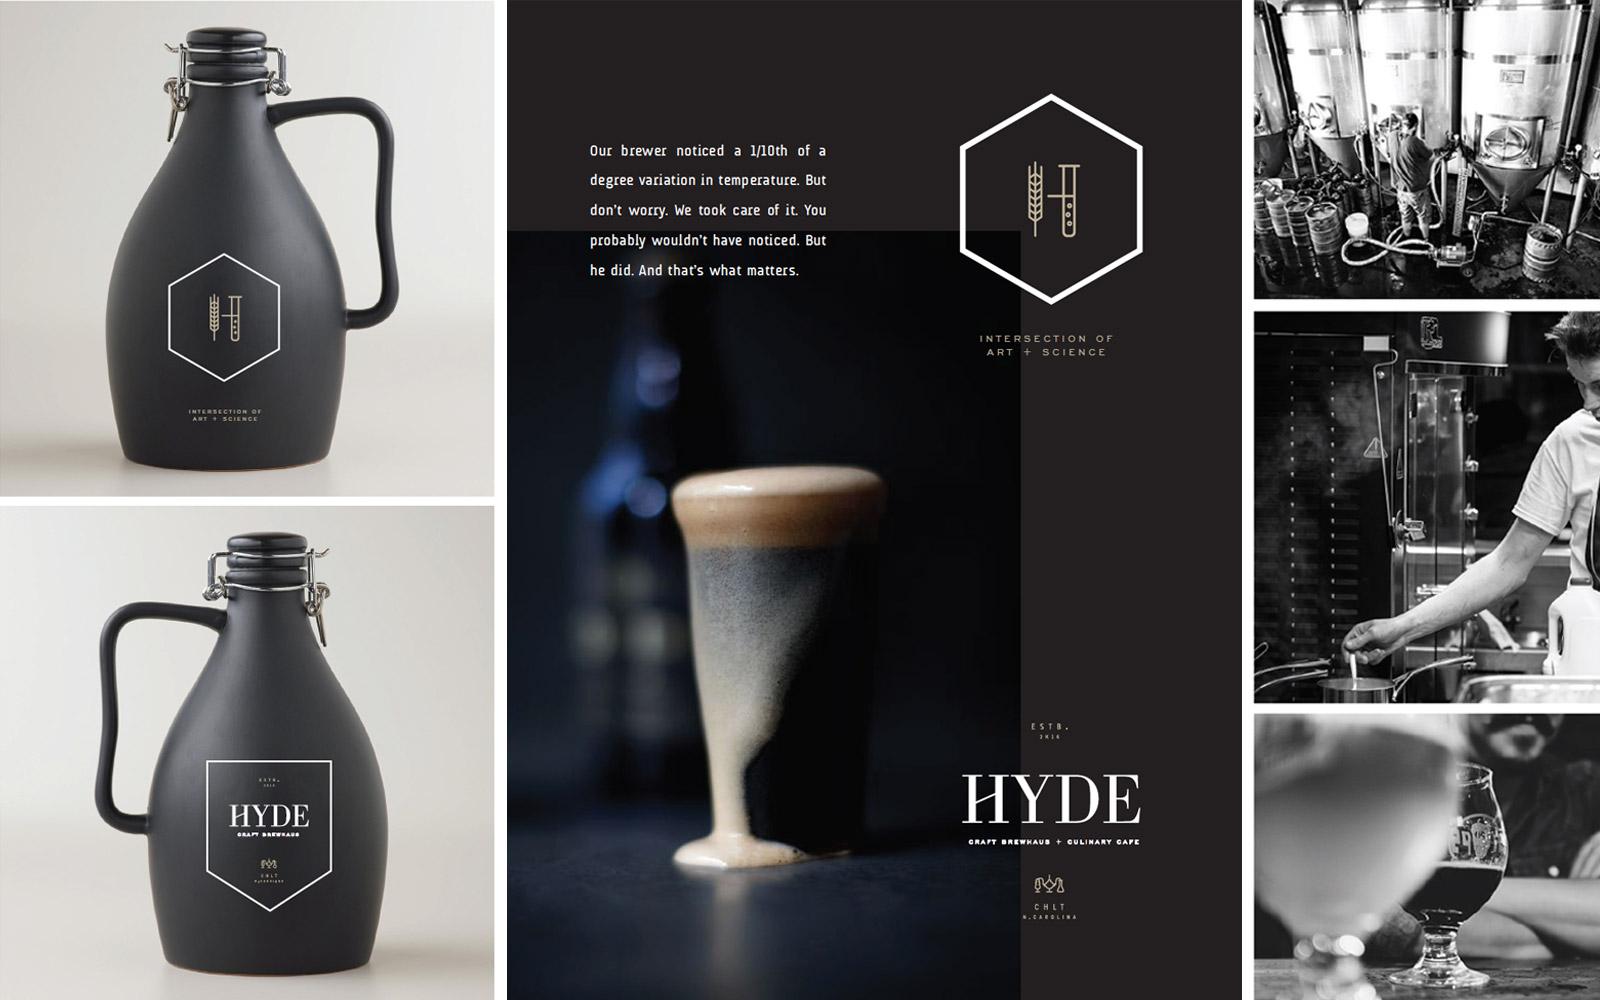 hyde-5